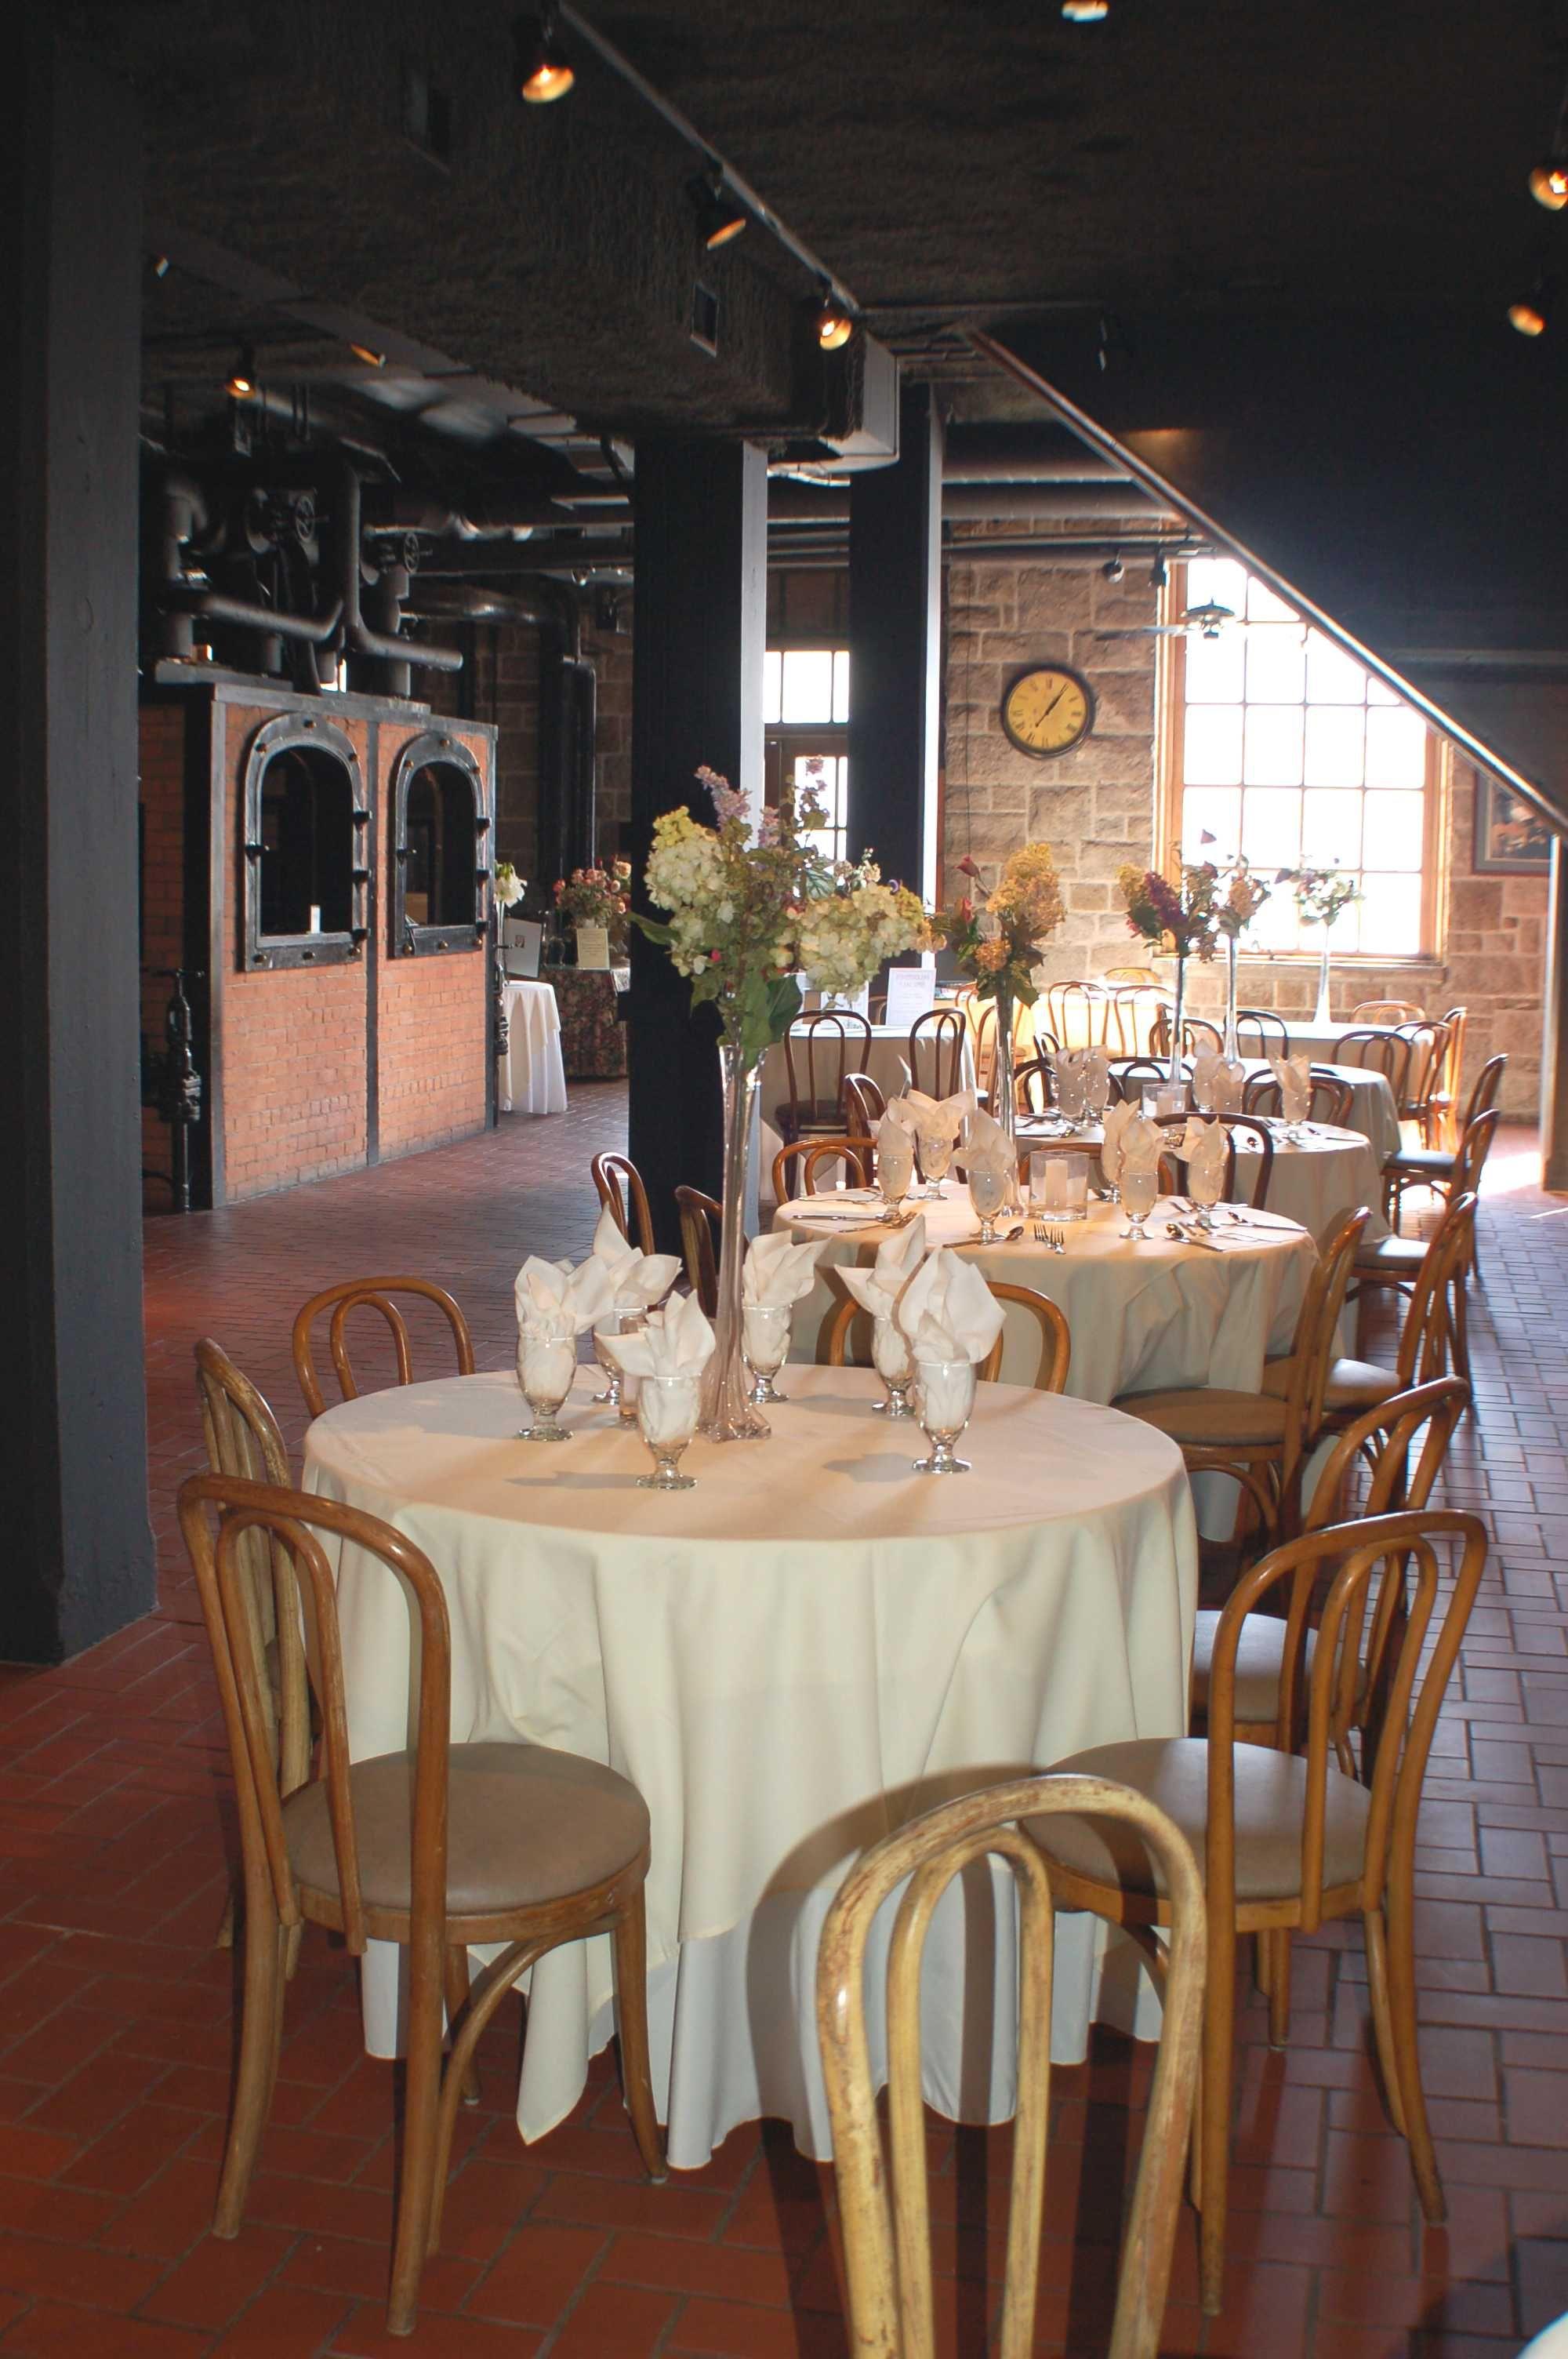 Raisin River Room Antique Inspired Wedding Chic Wedding Antique Inspiration